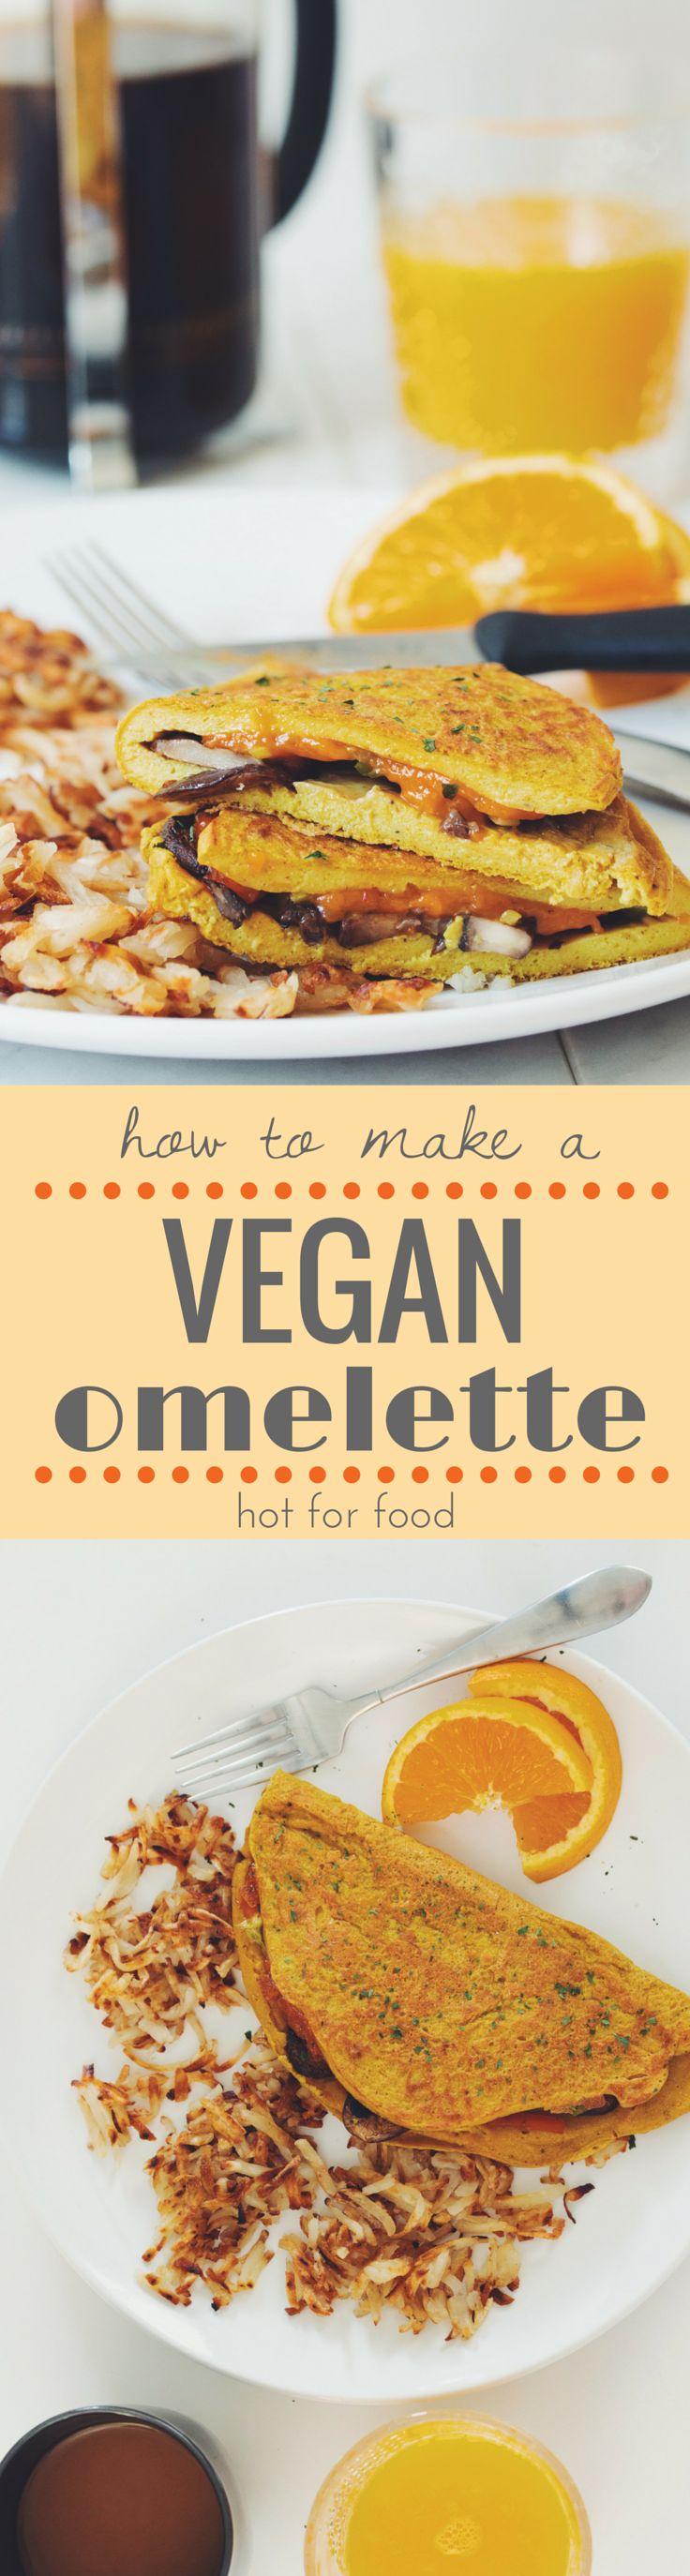 how to make a vegan omelette | RECIPE on hotforfoodblog.com